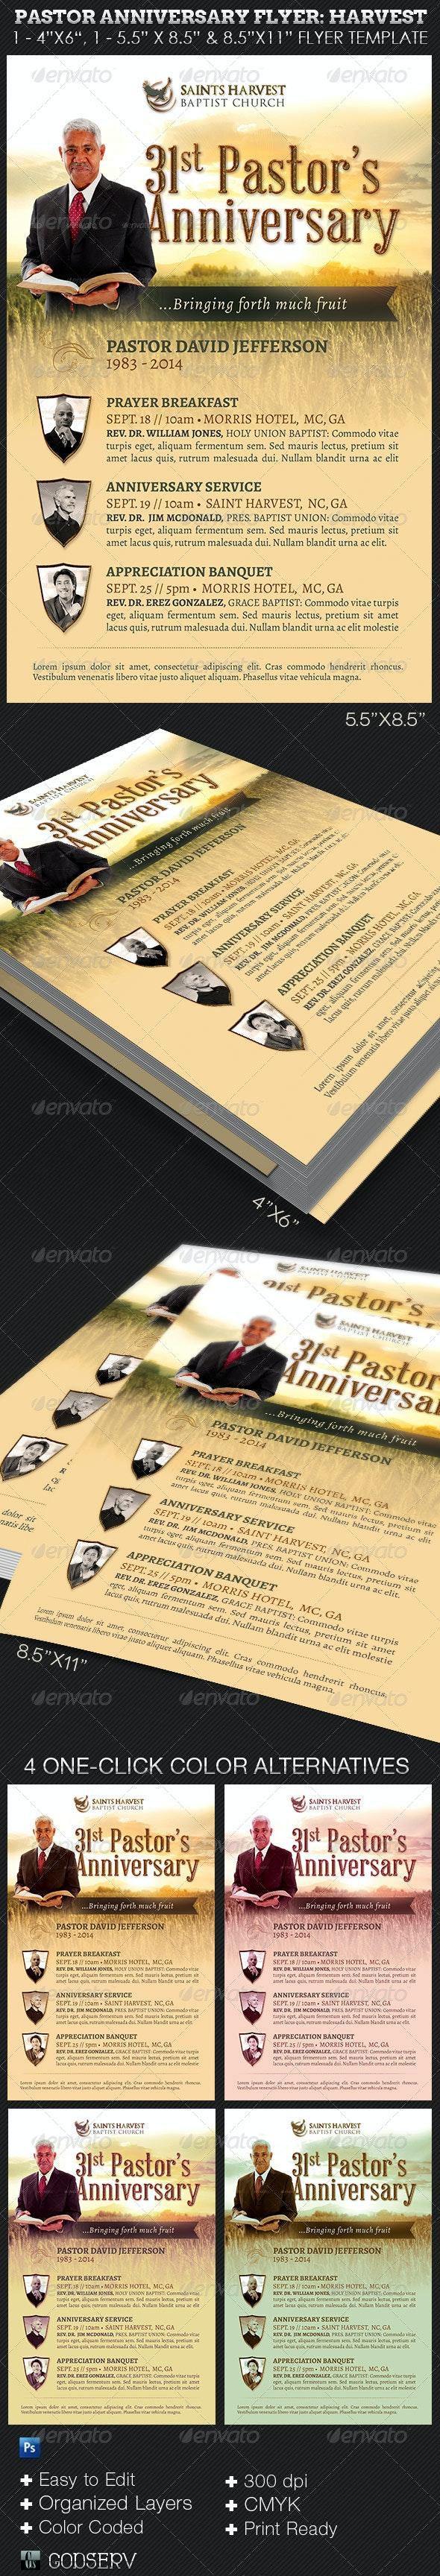 Pastor Anniversary Harvest Church Flyer Template - Church Flyers